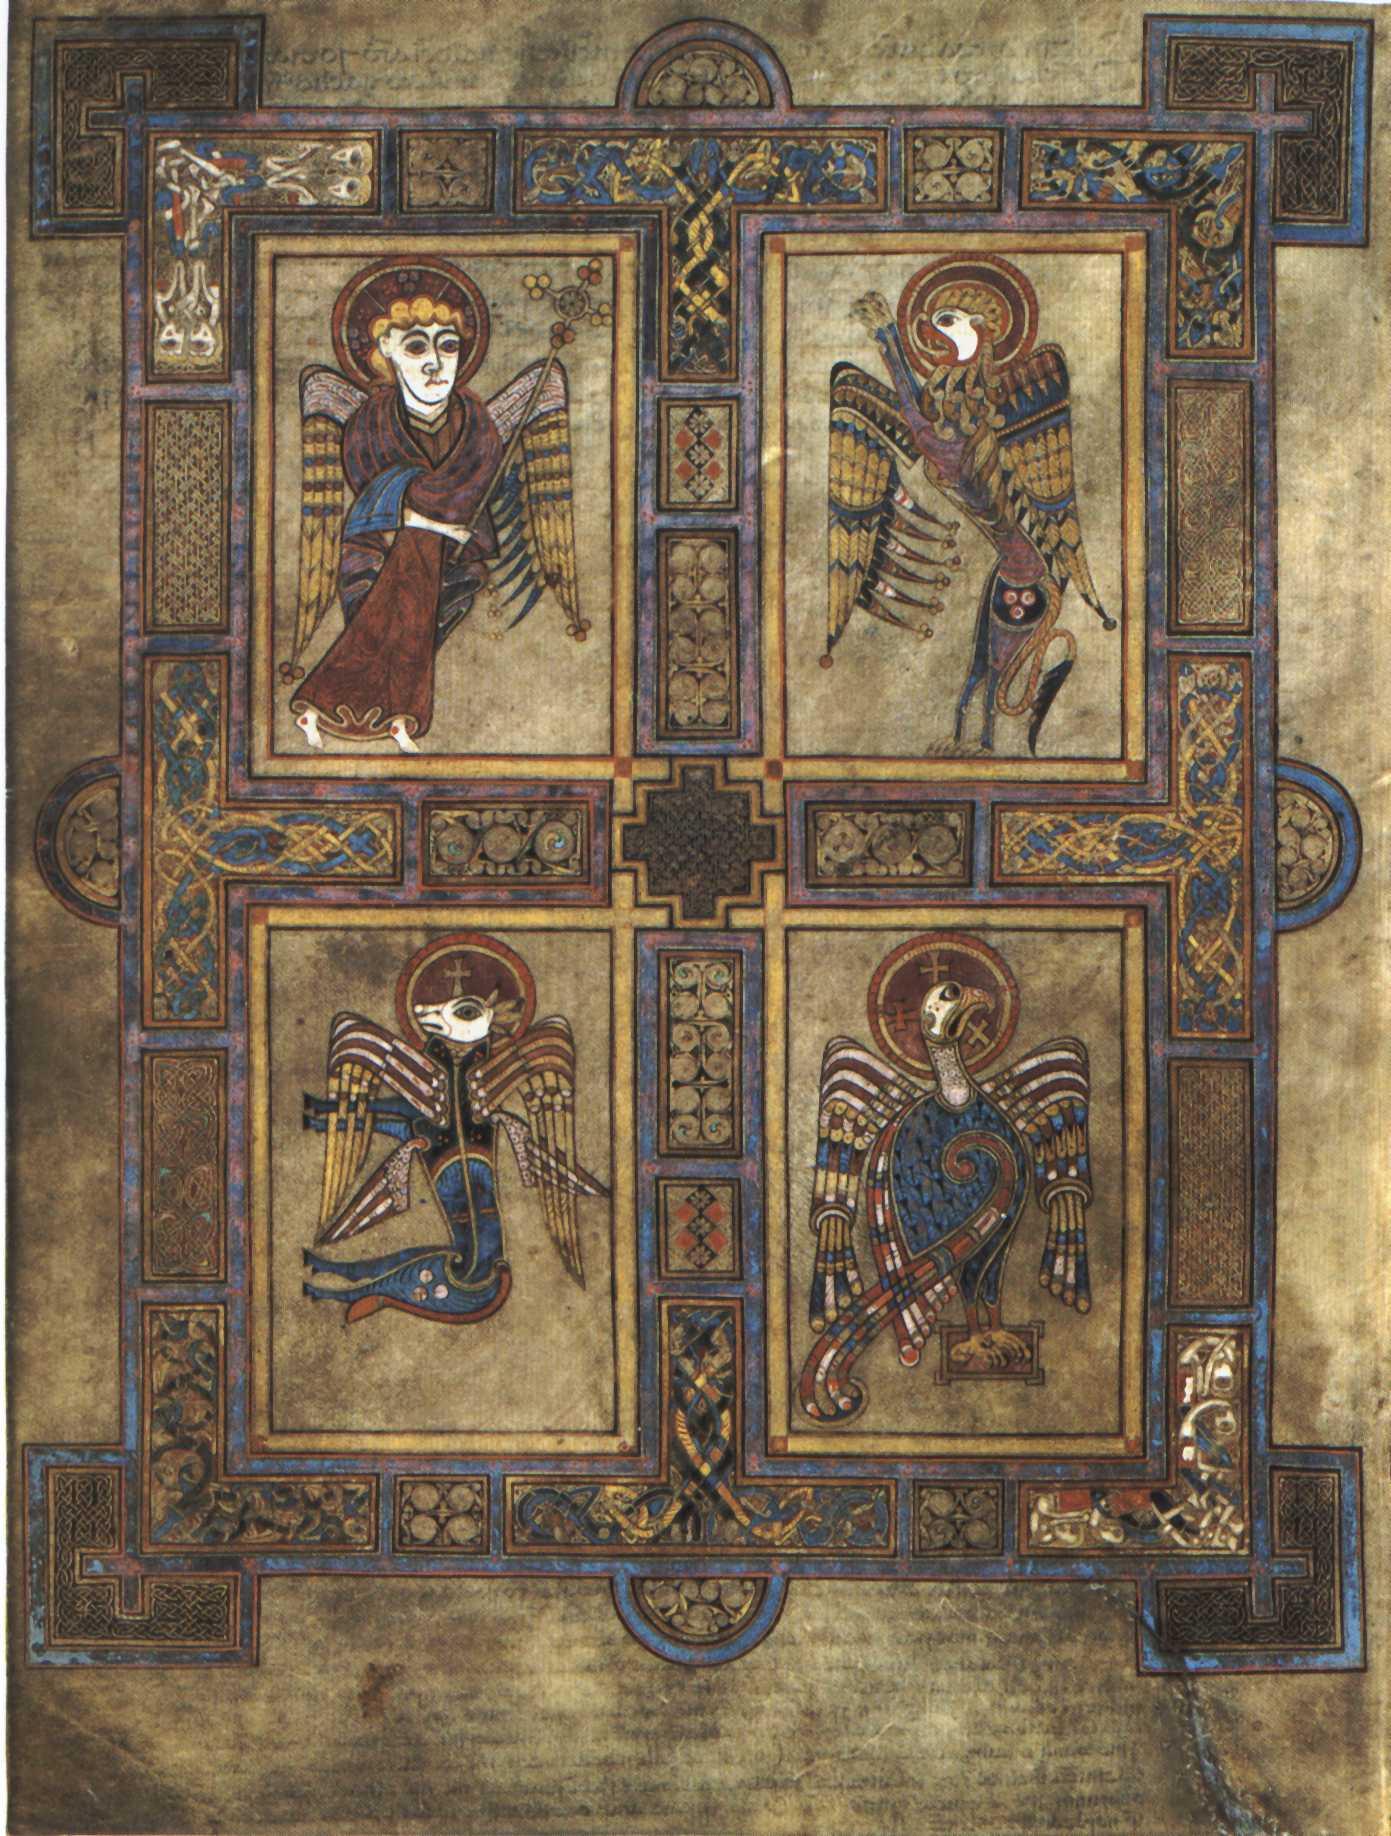 The Tetramorph of the Book of Kells, VIII century.